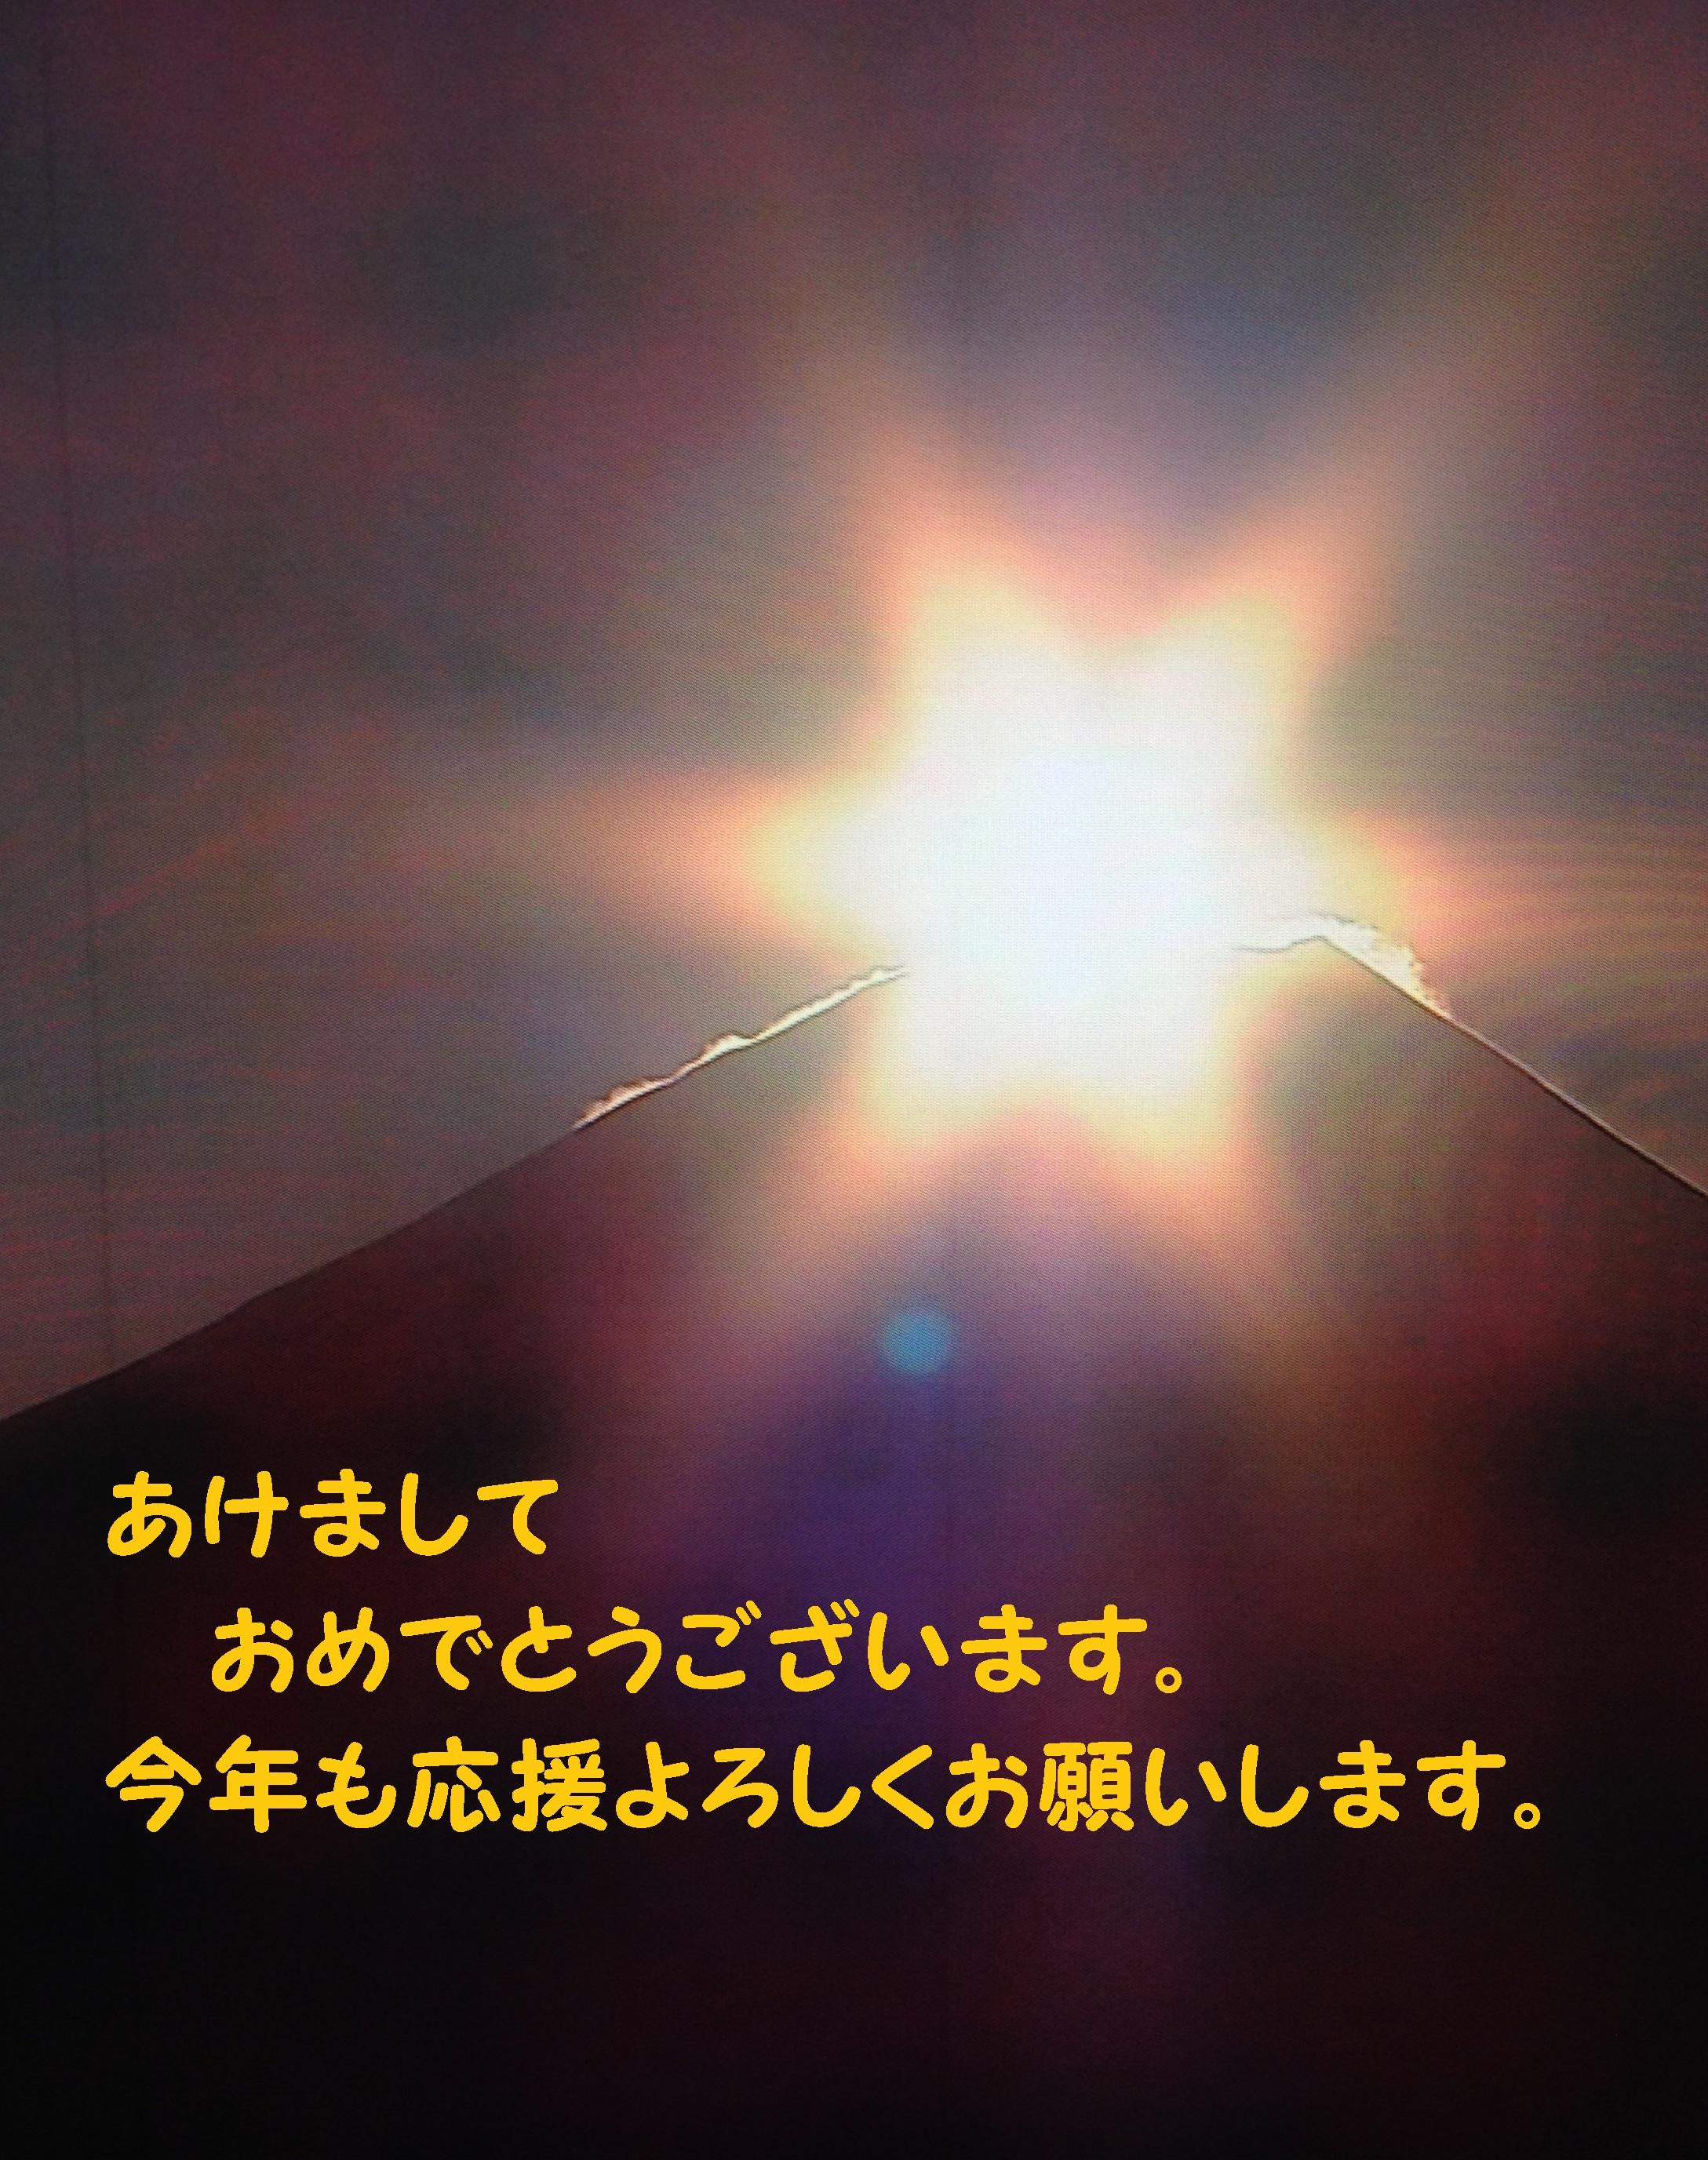 mt_fuji20160101hn01.jpg